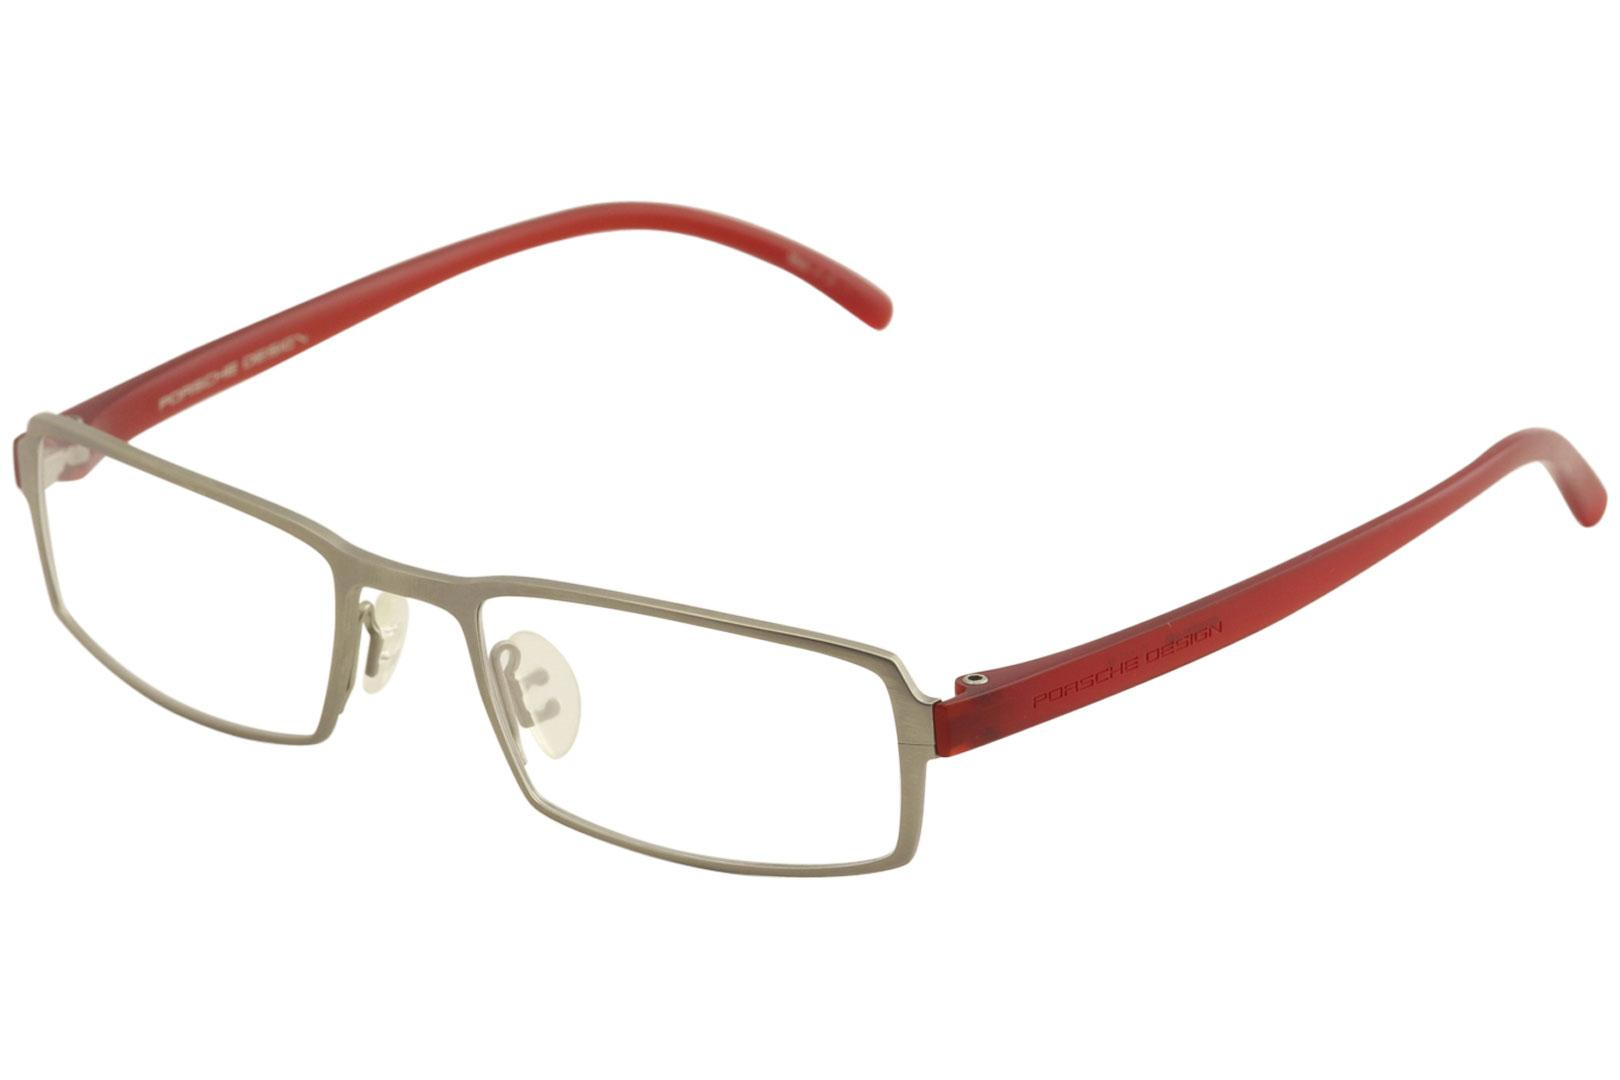 5b930587bf Porsche Design Men s Eyeglasses P8146 P 8146 Full Rim Titanium Optical Frame